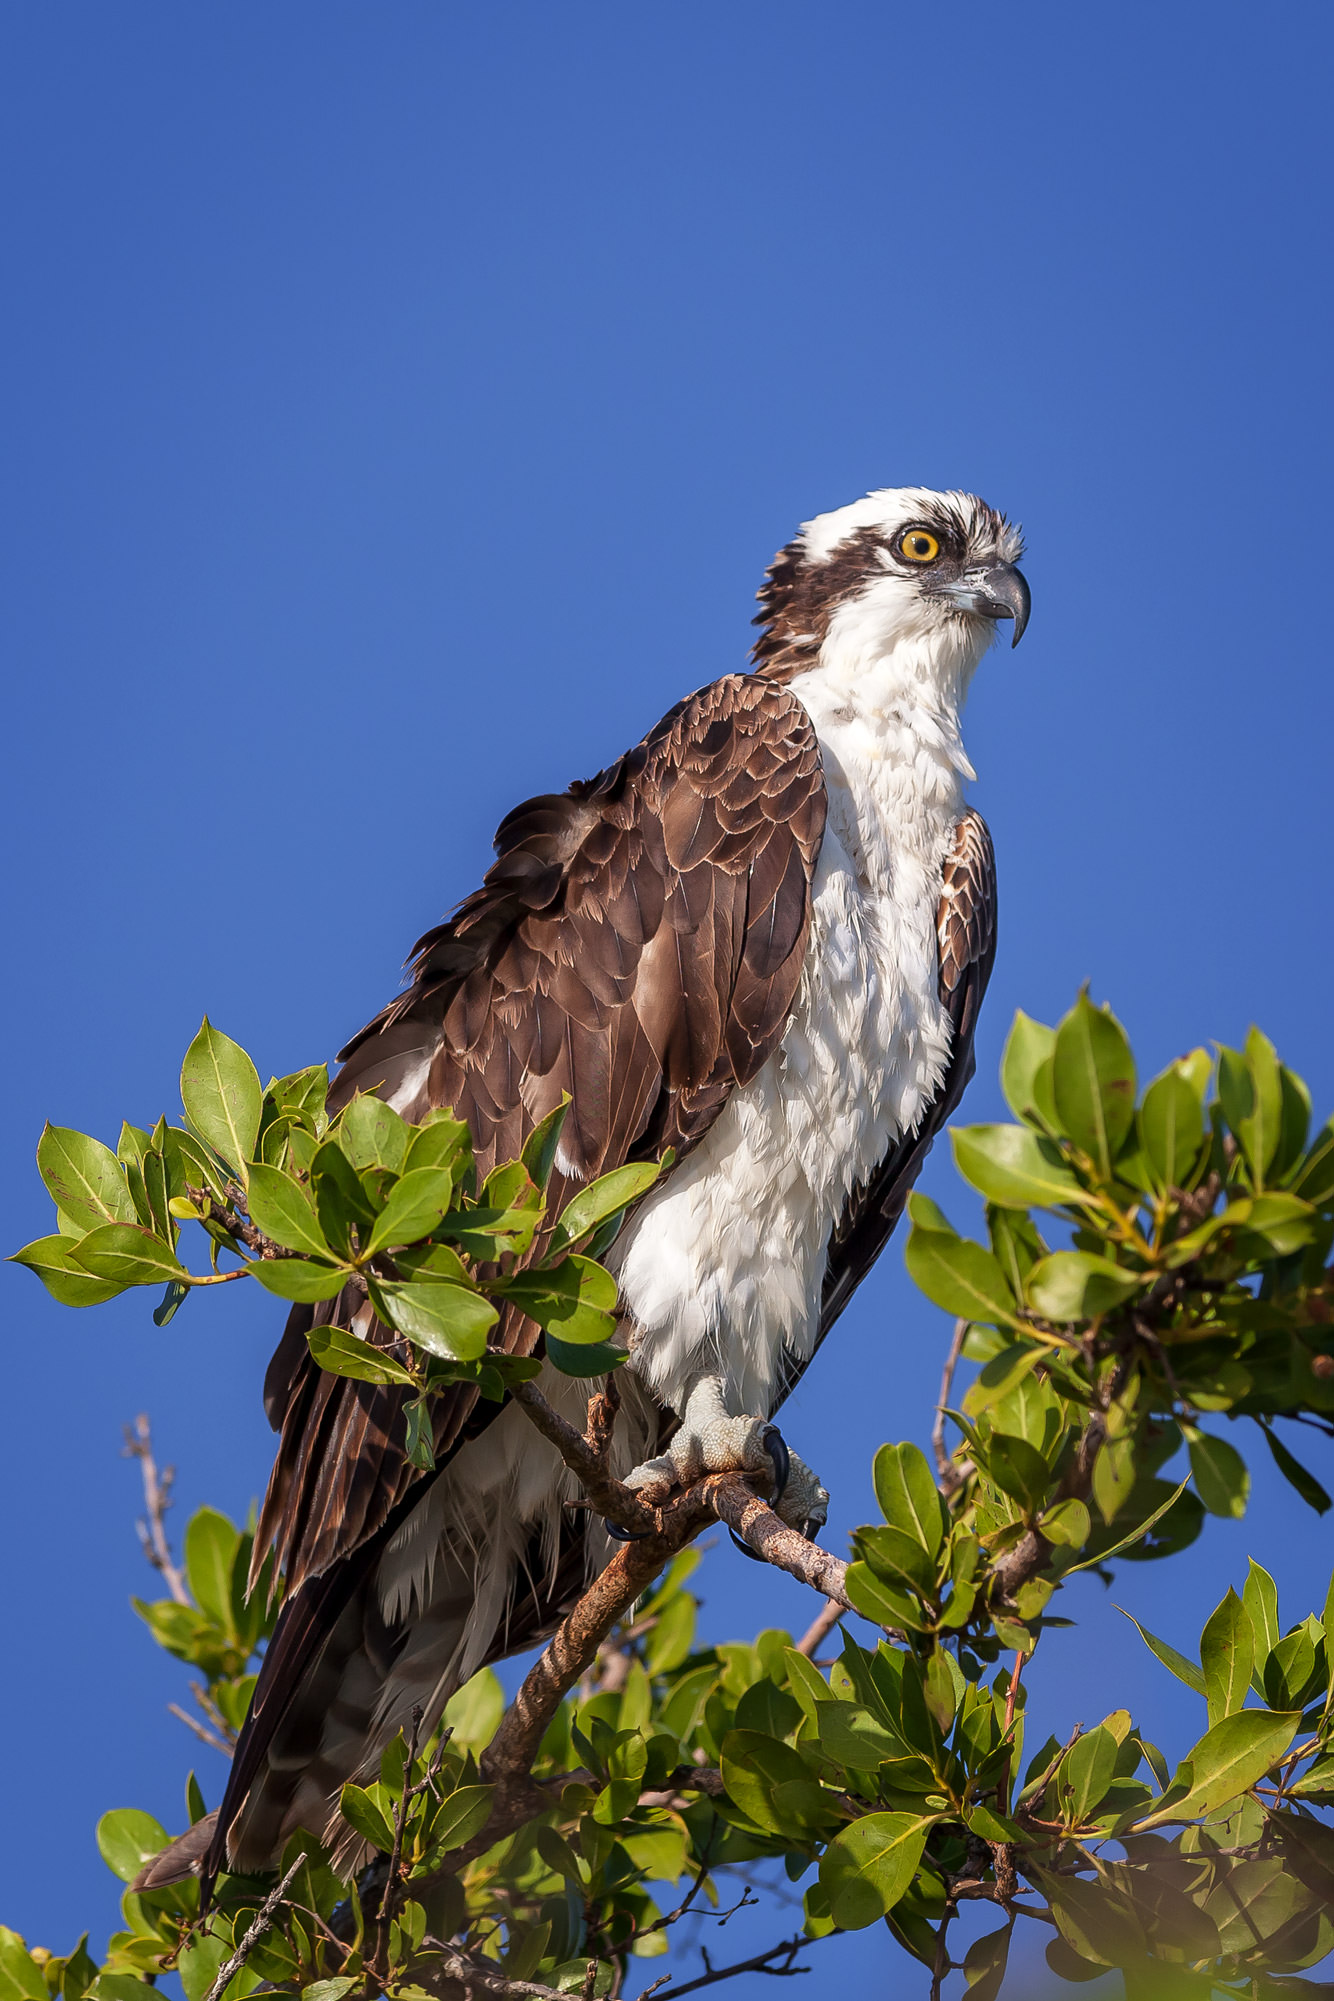 Osprey, Florida, limited edition, photograph, fine art, wildlife, photo